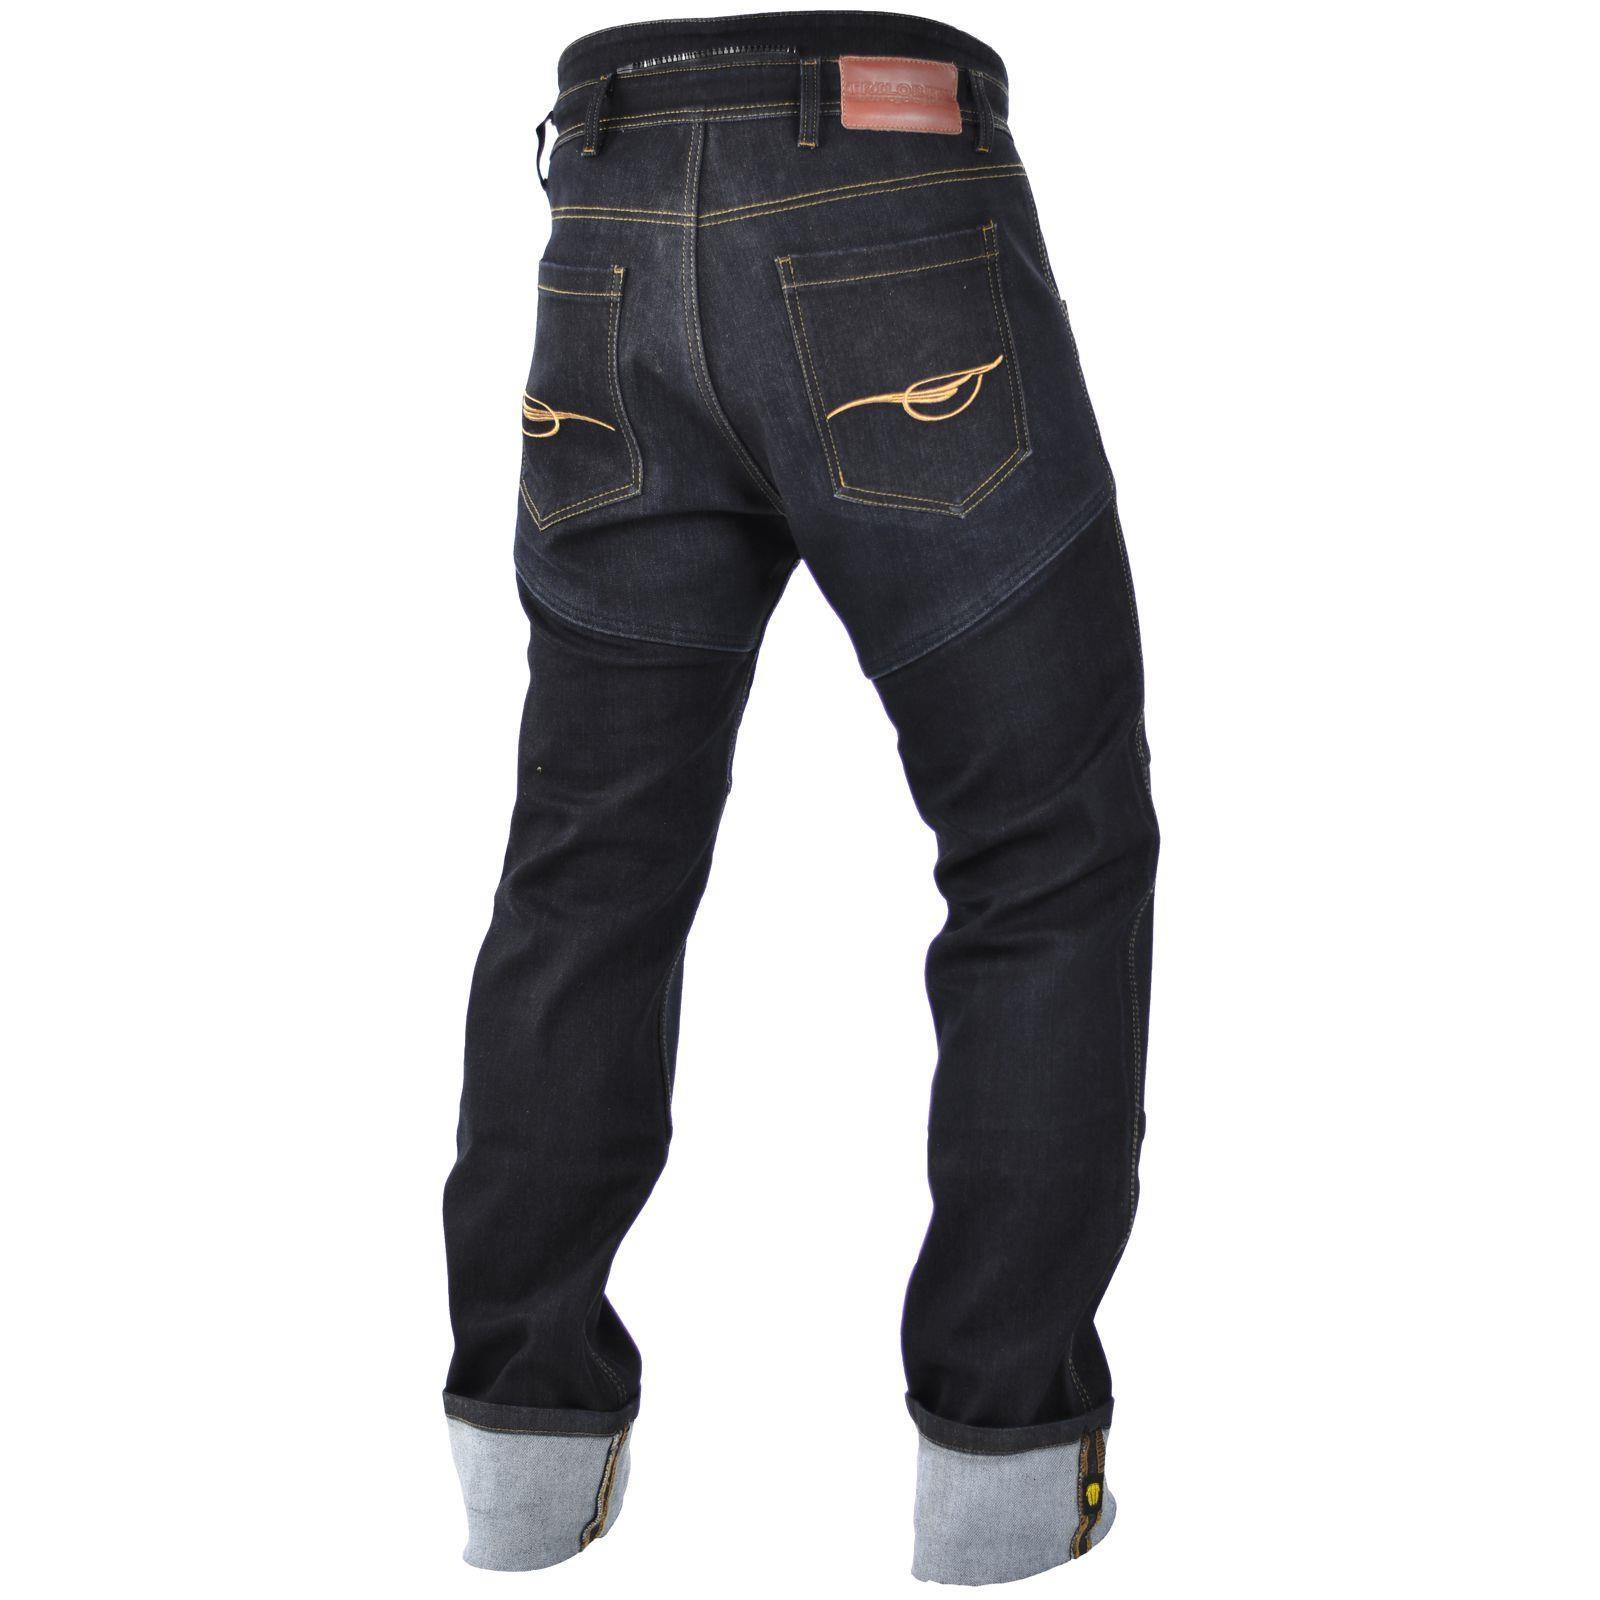 Trilobite-Pantaloni-Moto-Jeans-Abbigliamento-Parado-MICAS-URBAN-DUAL-PANTS-ACID miniatura 16